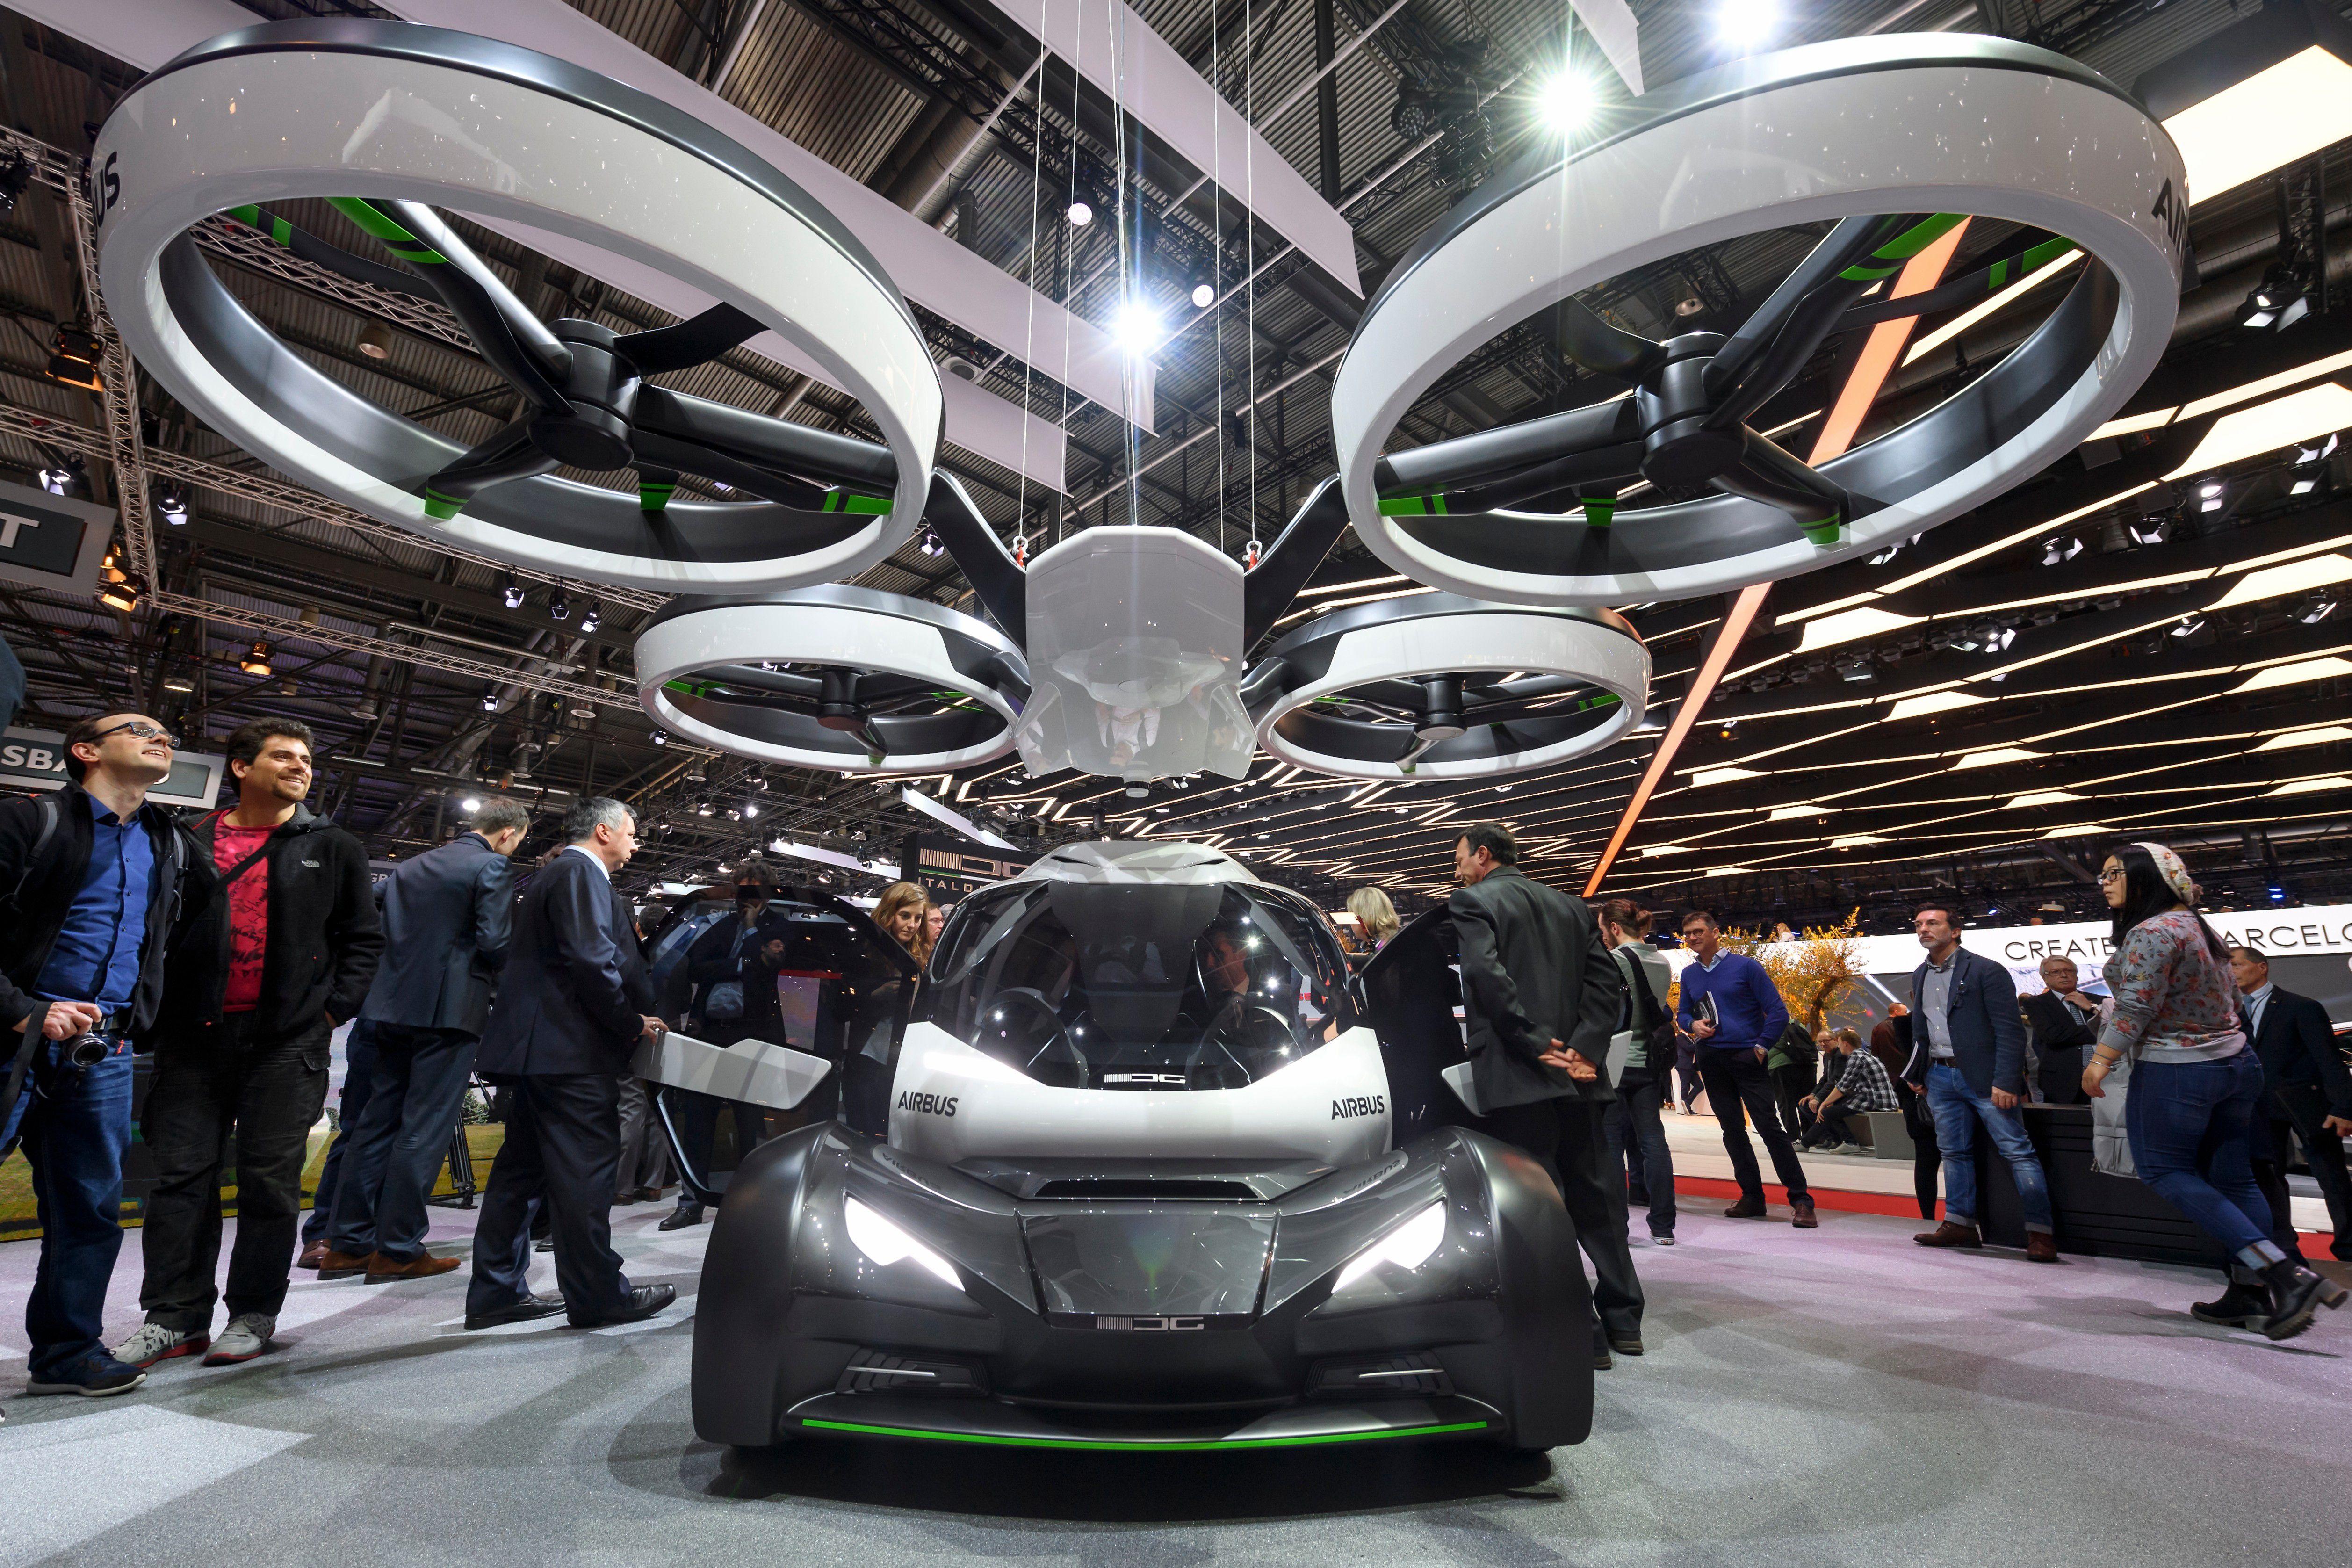 Airbus 展出模組化無人飛行車概念 Flying car, Concept cars, Weird cars